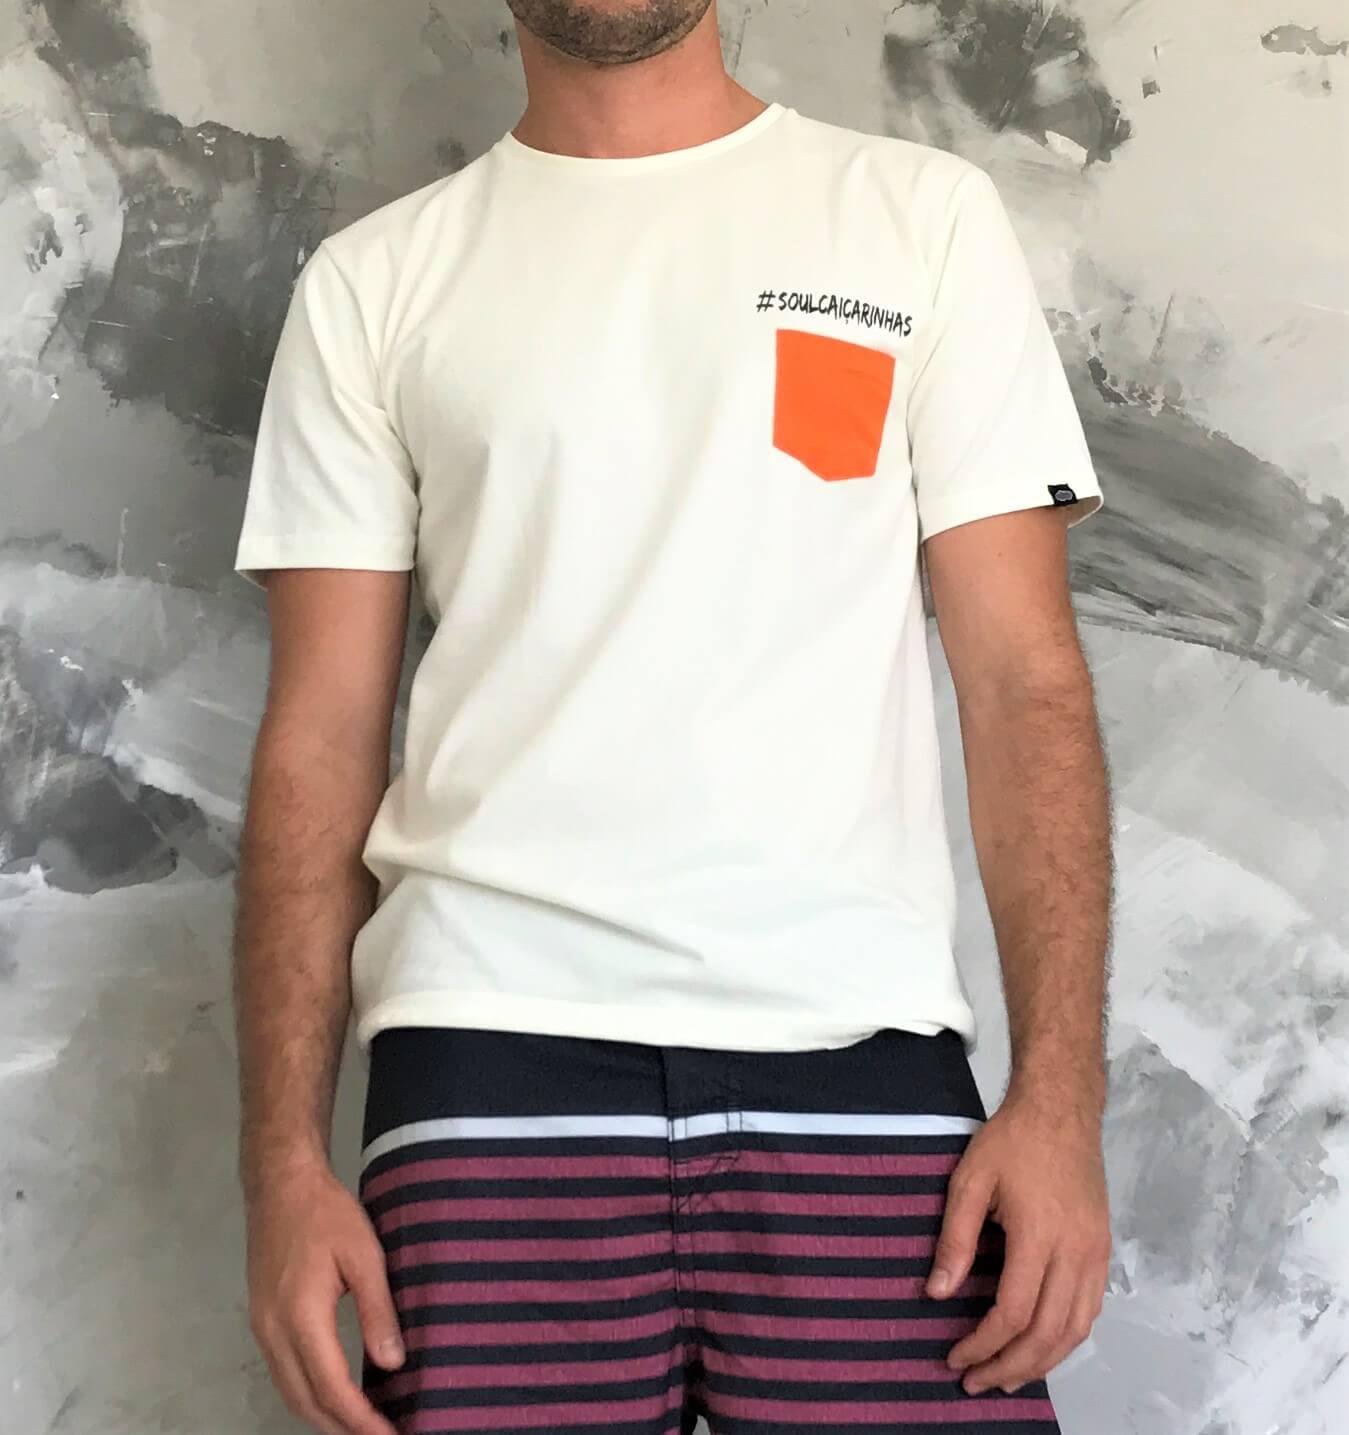 Kit Família - 3 Camisetas Soul Caiçarinhas Bege